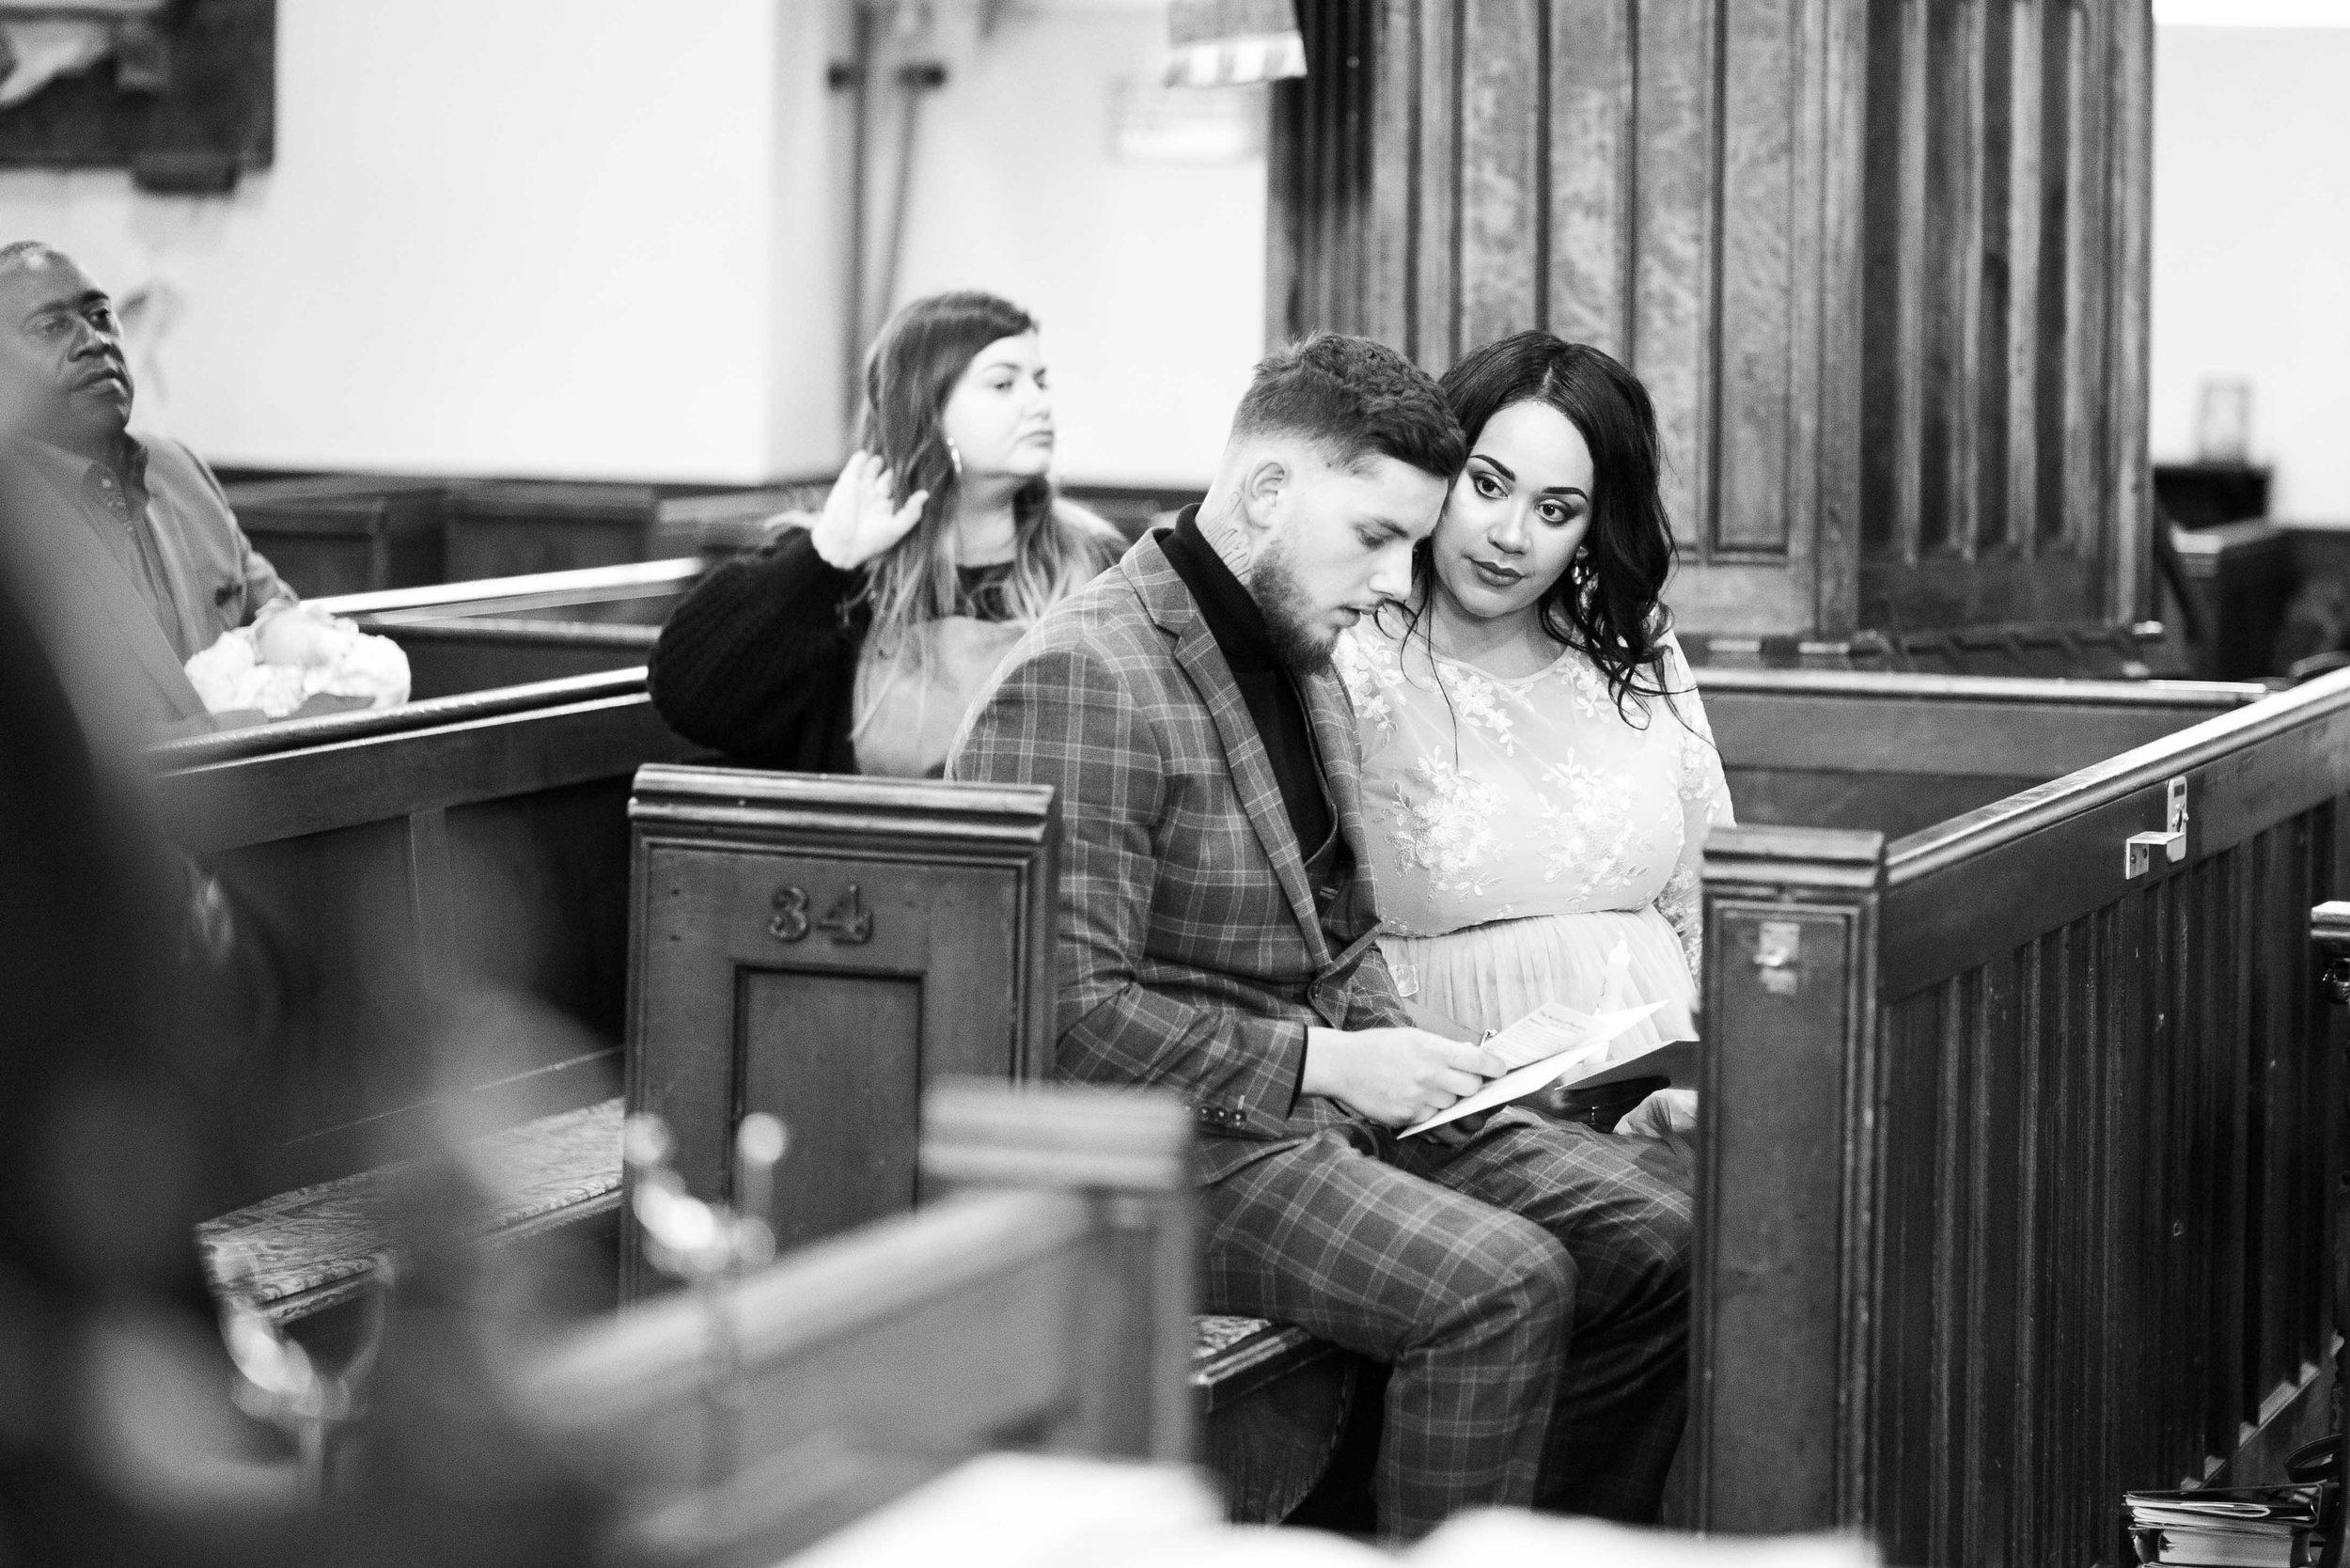 Lea-cooper-photography-christening-photographer-baptism-wolverhampton-wednesbury-walsall-willenhall-dudley-church-chapel-event-photography-16.jpg